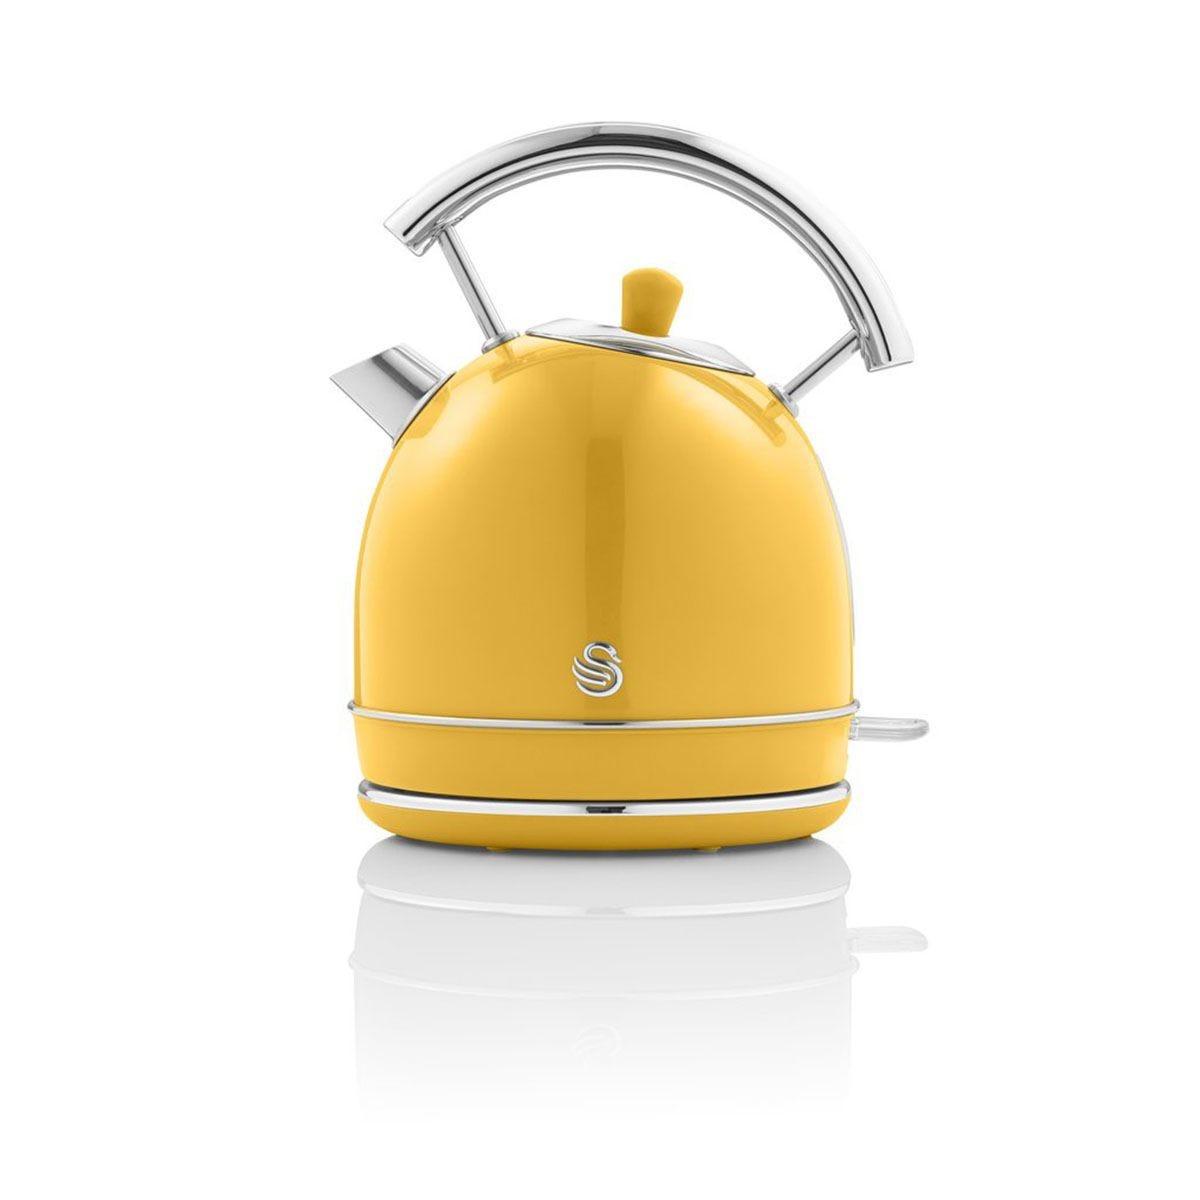 Swan SK14630YELN 1.8L 3000W Dome Kettle - Yellow